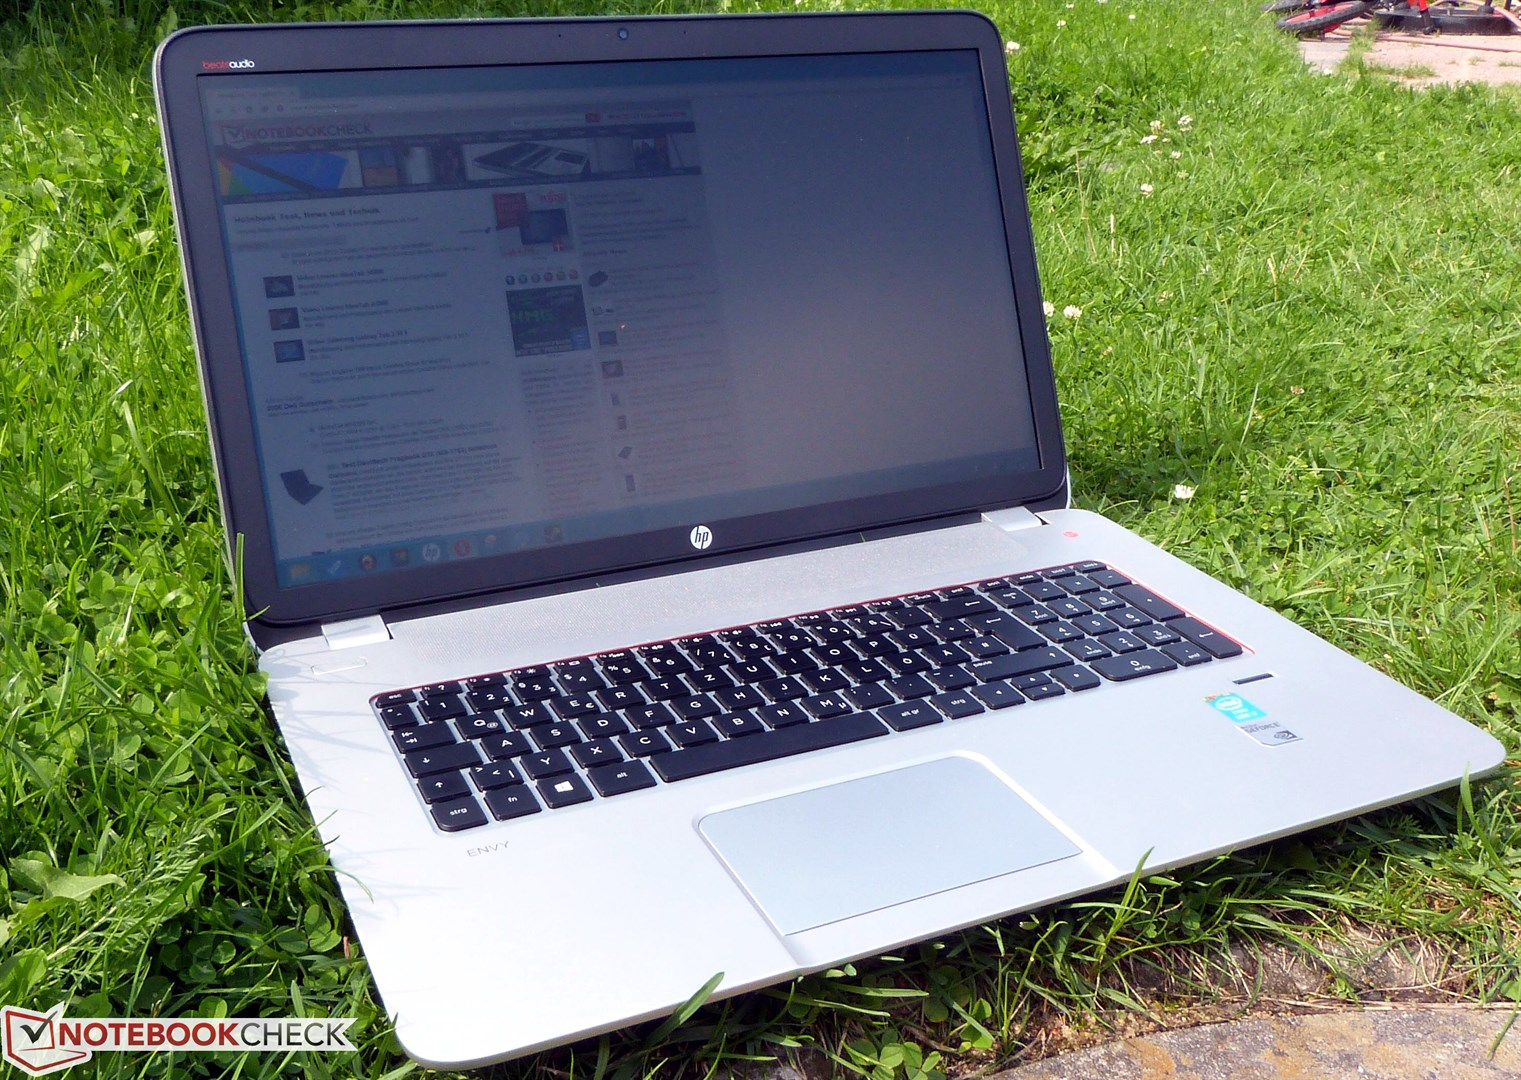 HP Envy 17-2002xx Notebook New